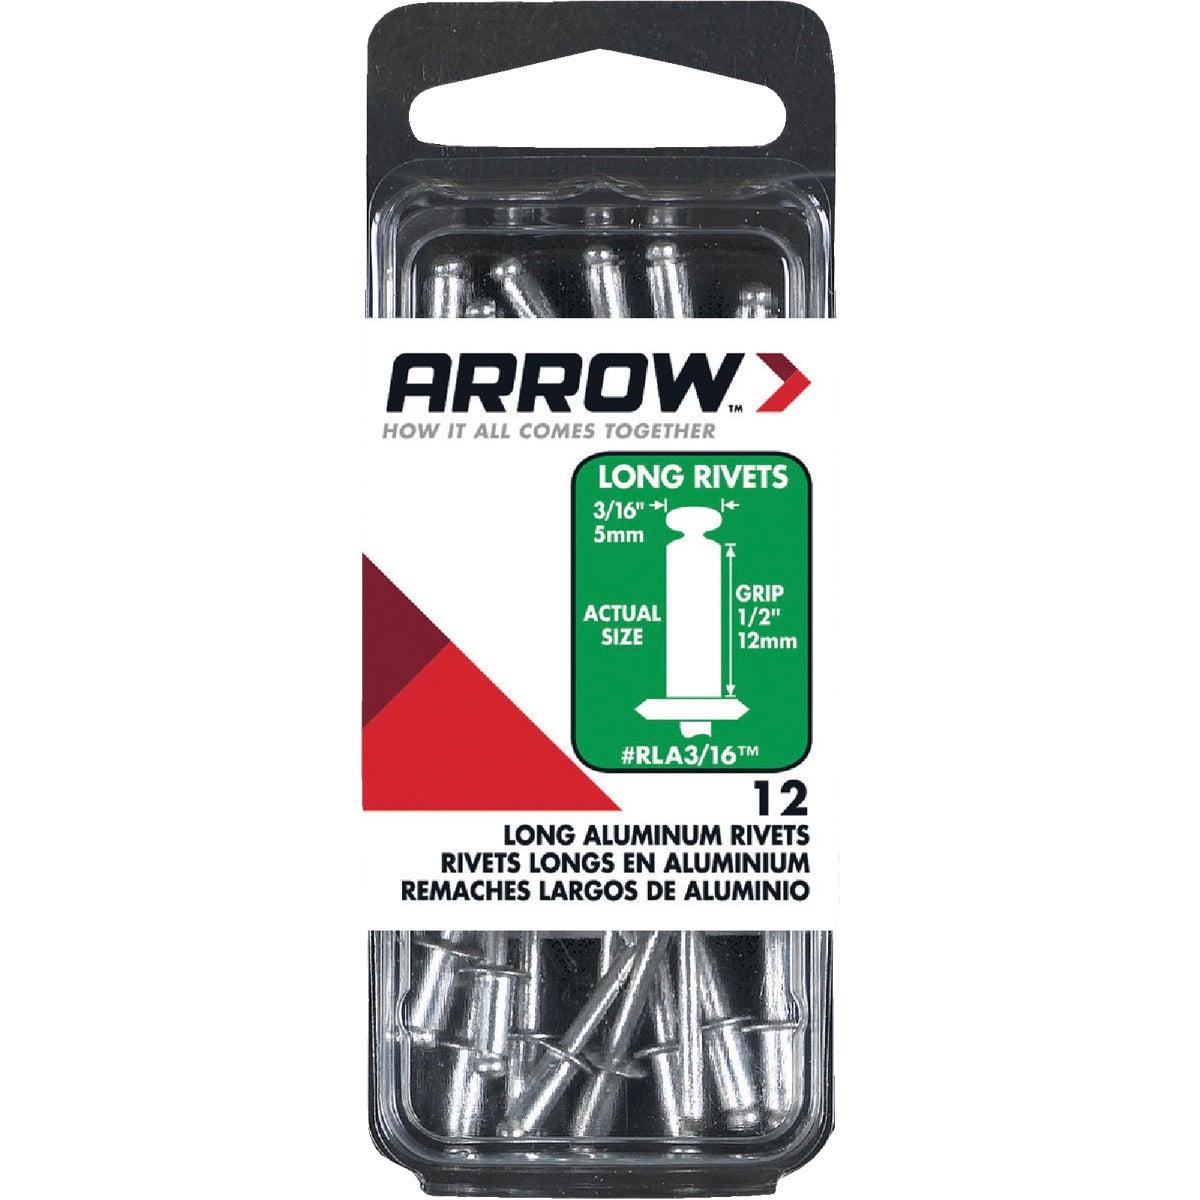 Arrow Fastener 3/16X1/2 ALUM RIVET RLA3/16